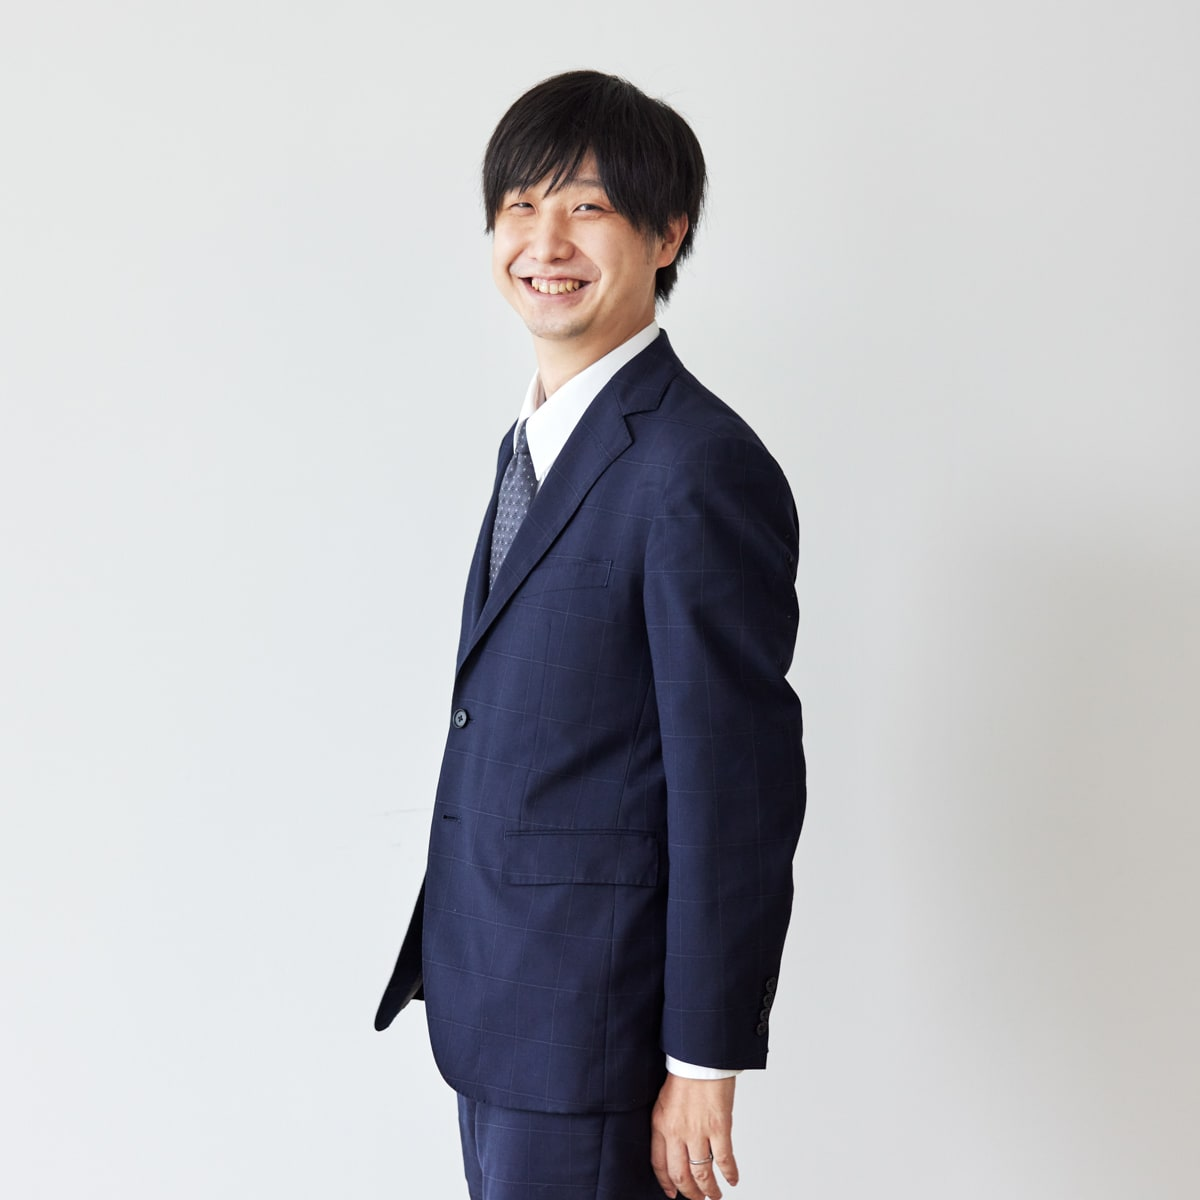 Toshihide Nishima